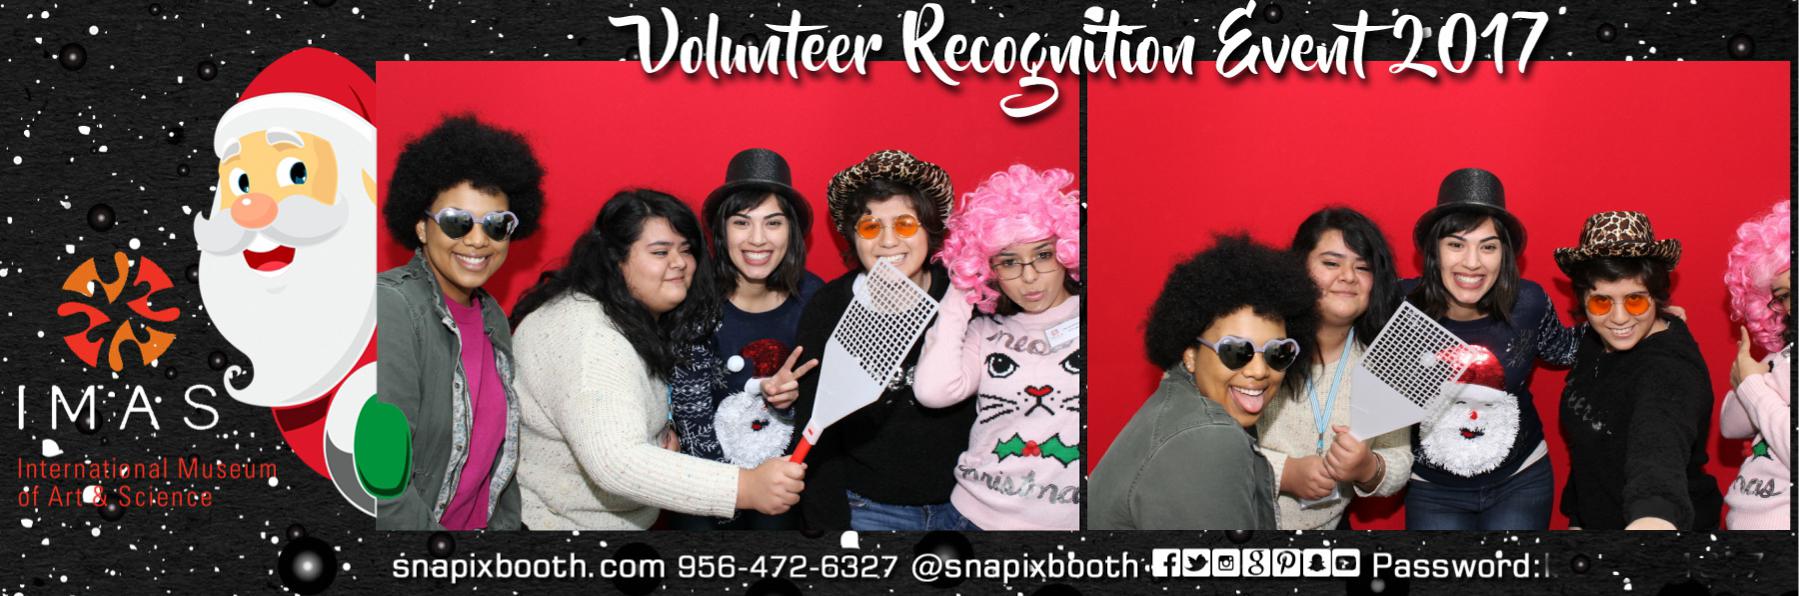 IMAS Volunteer Recognition